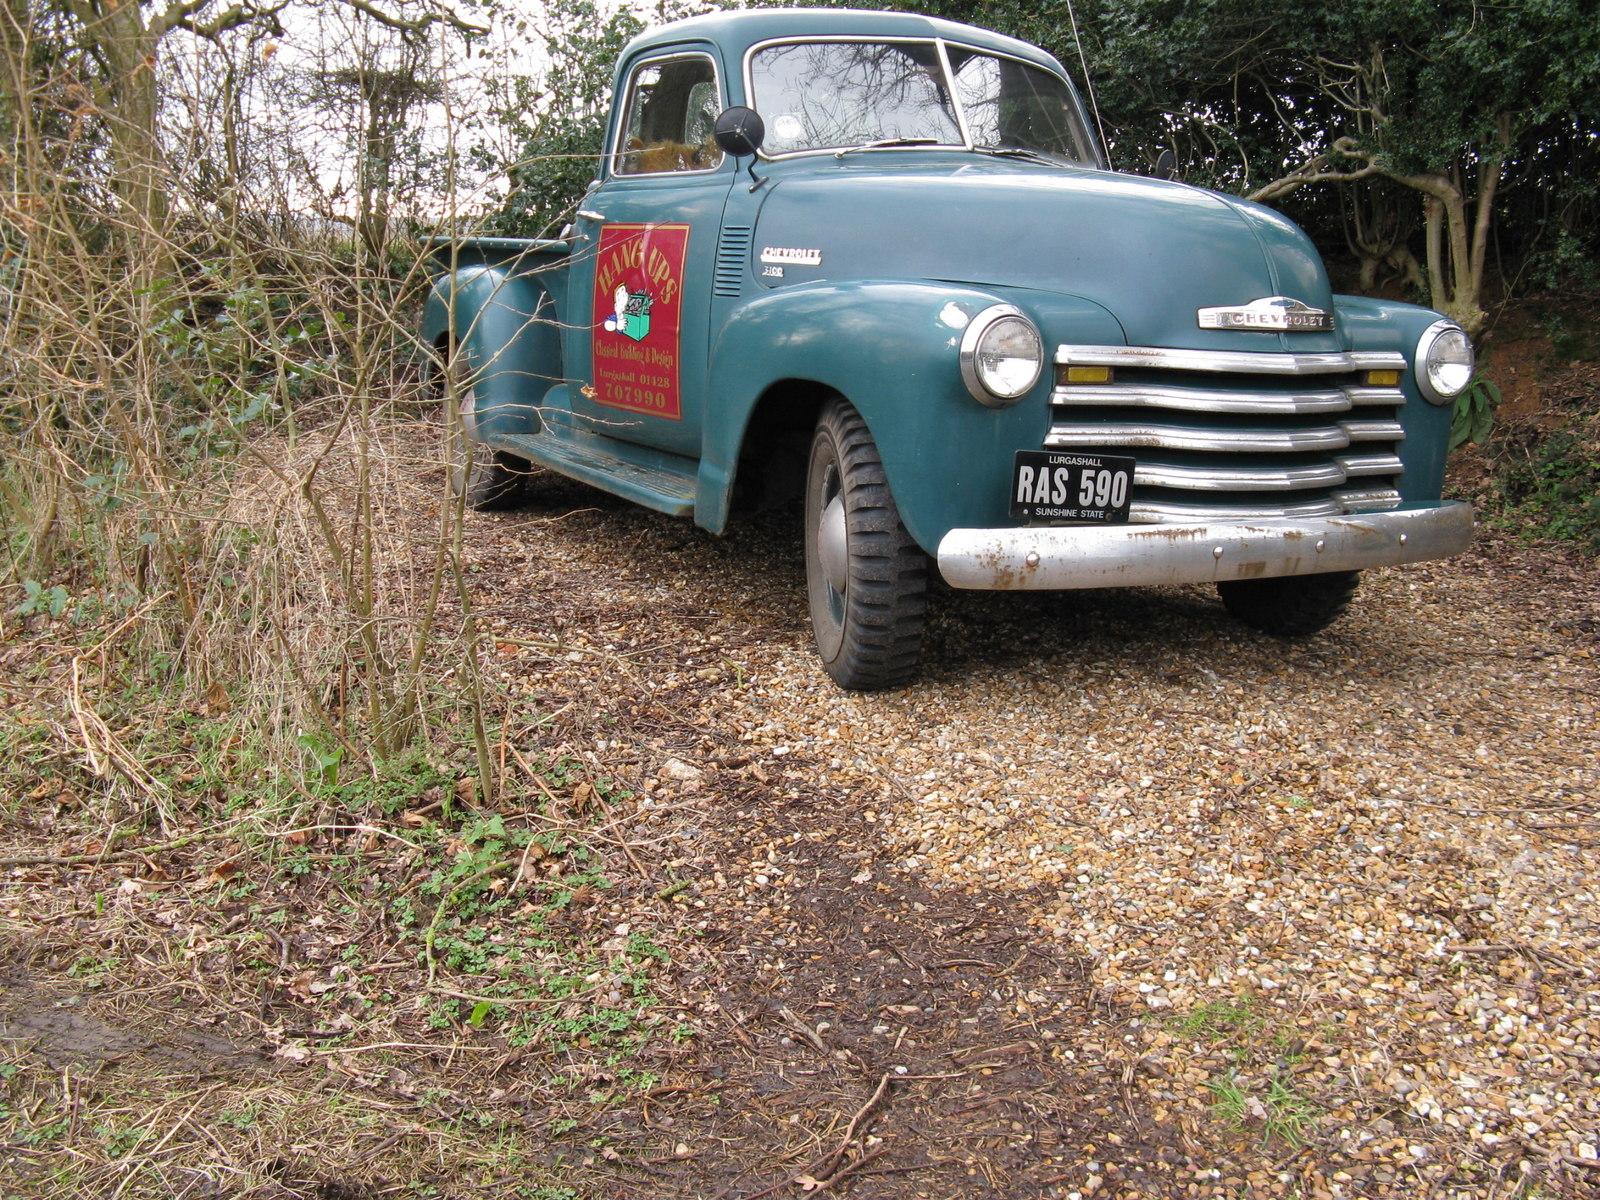 File:Classic Chevrolet pickup - geograph.org.uk - 1734666.jpg ...